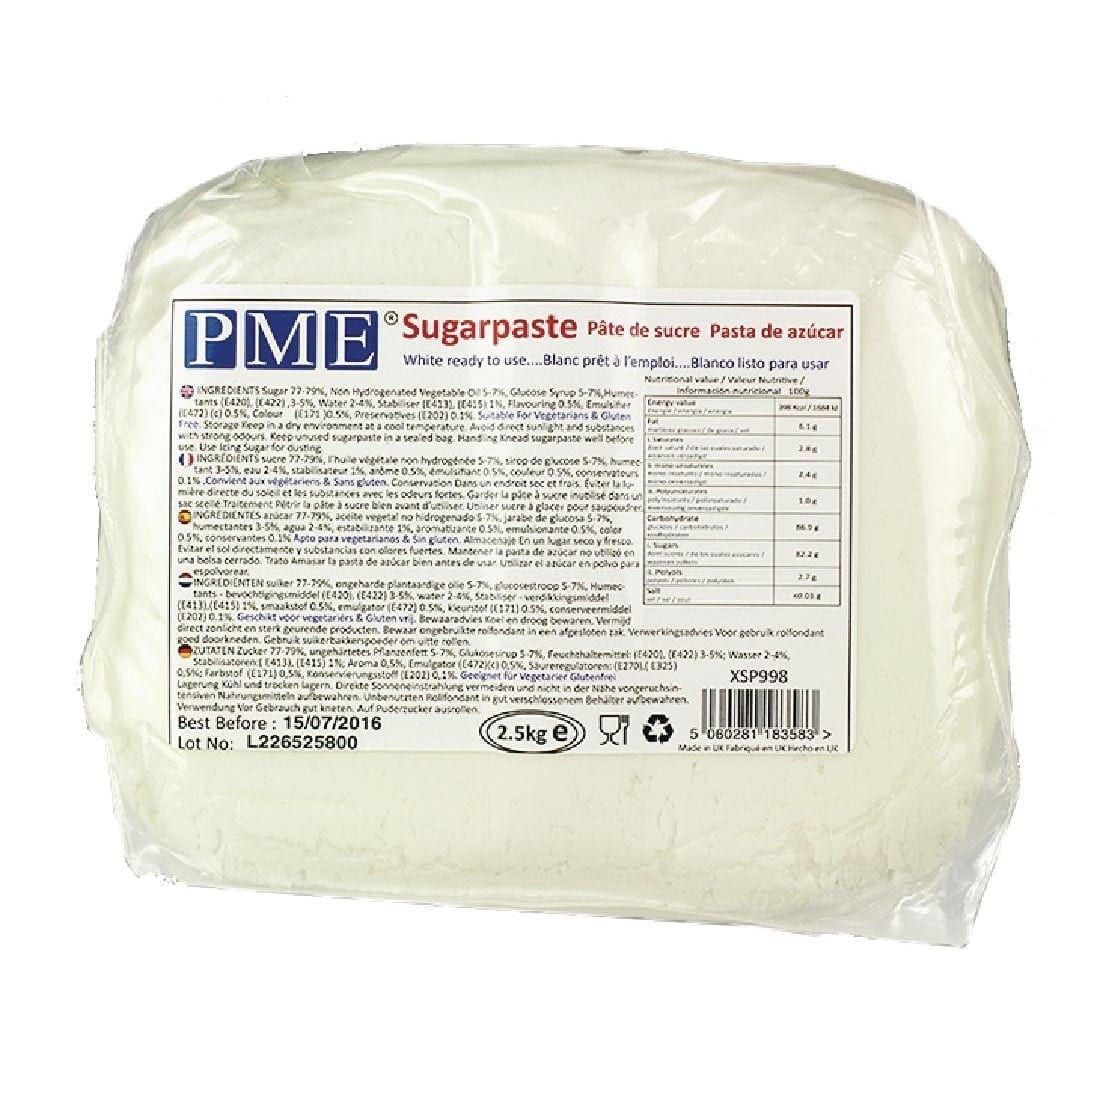 PME Sugarpaste White - 2.5kg-0